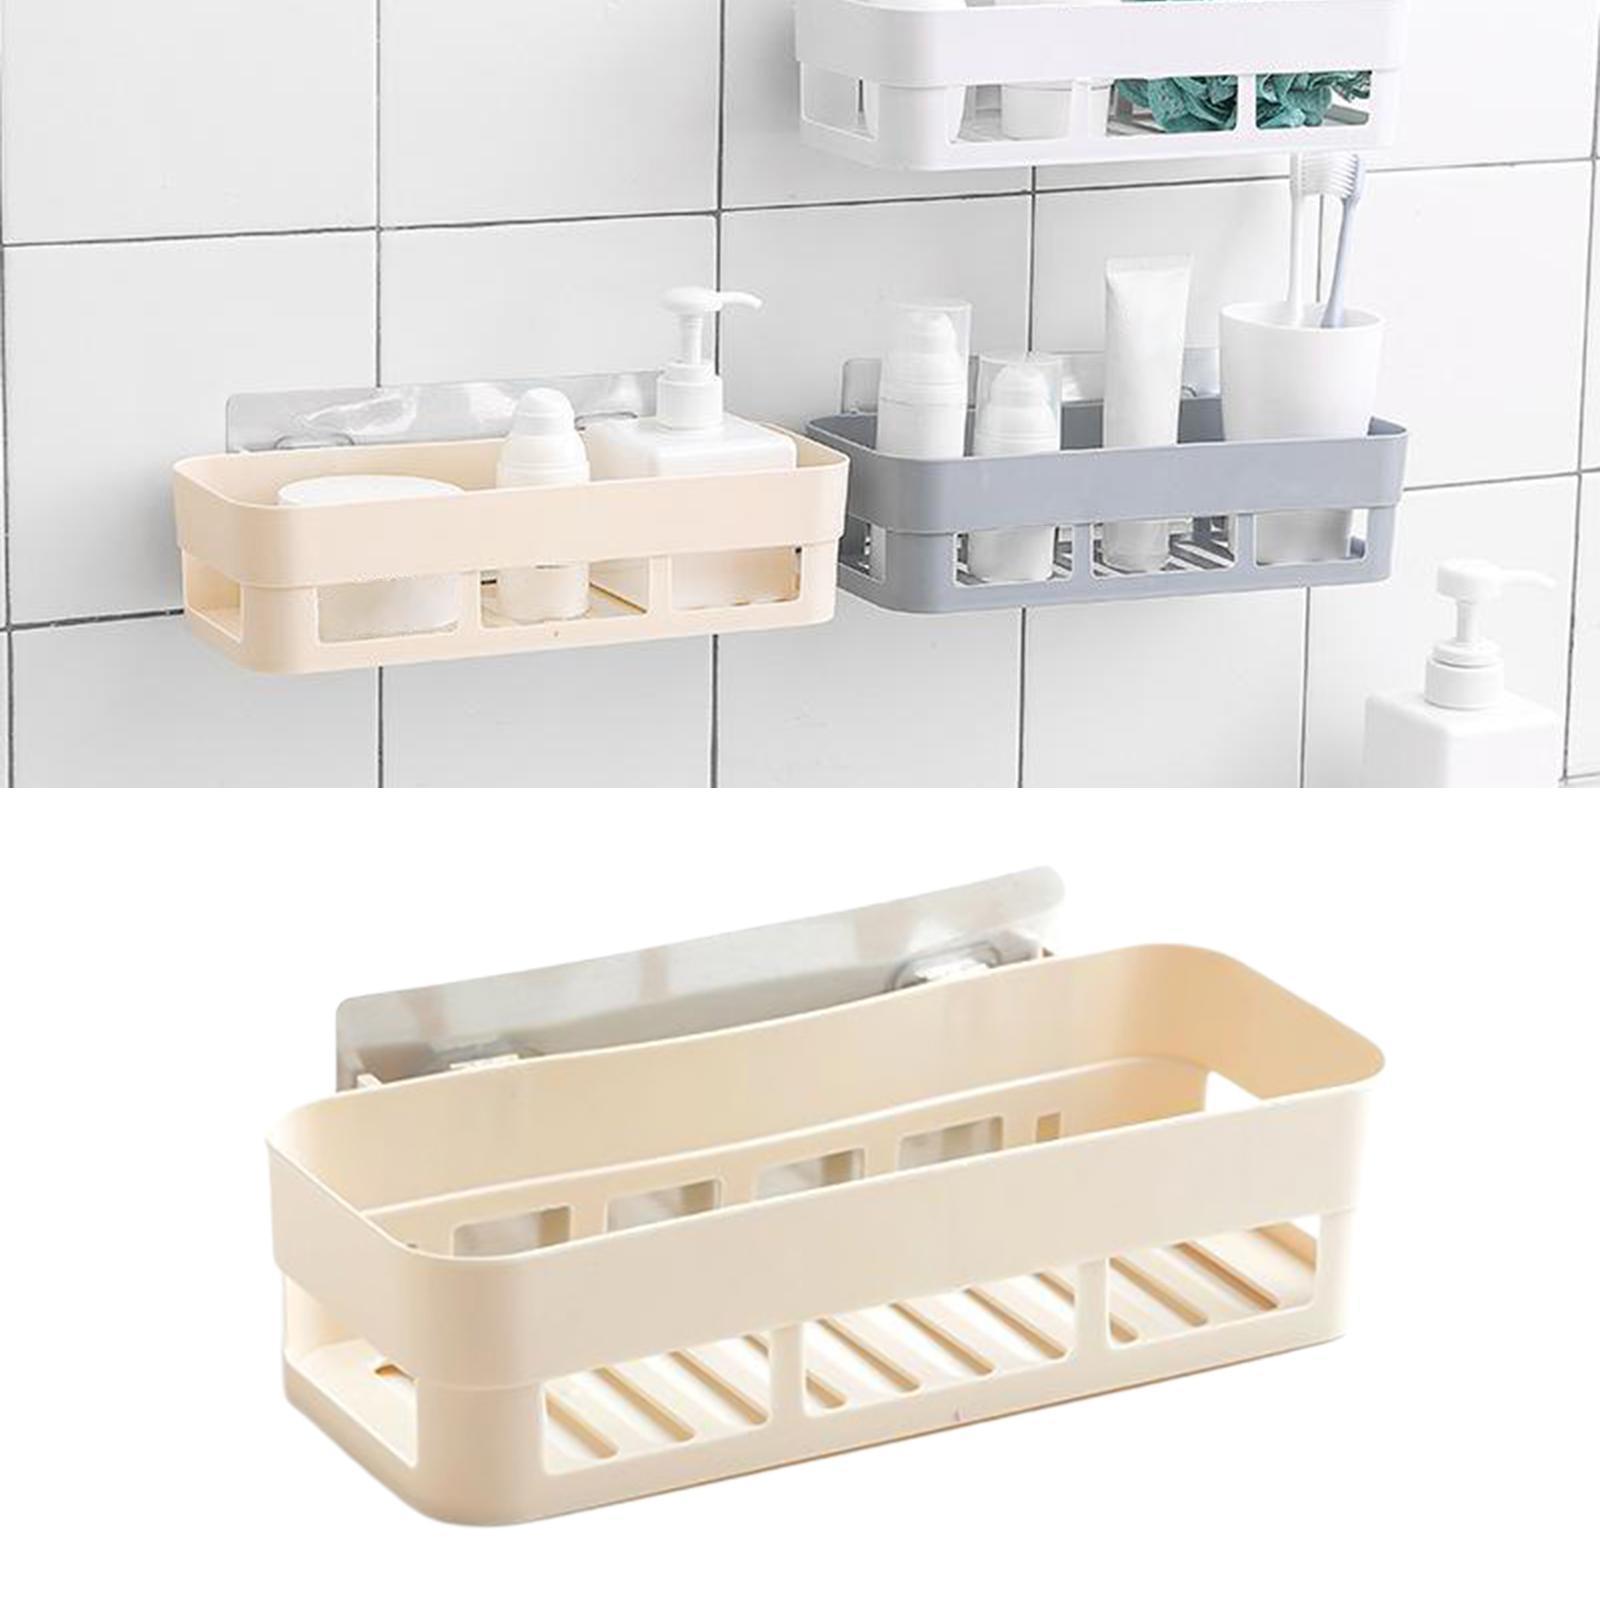 thumbnail 23 - Wall-Suction-Bathroom-Shelf-Shower-Caddy-Wall-Mount-Storage-Rack-Organizer